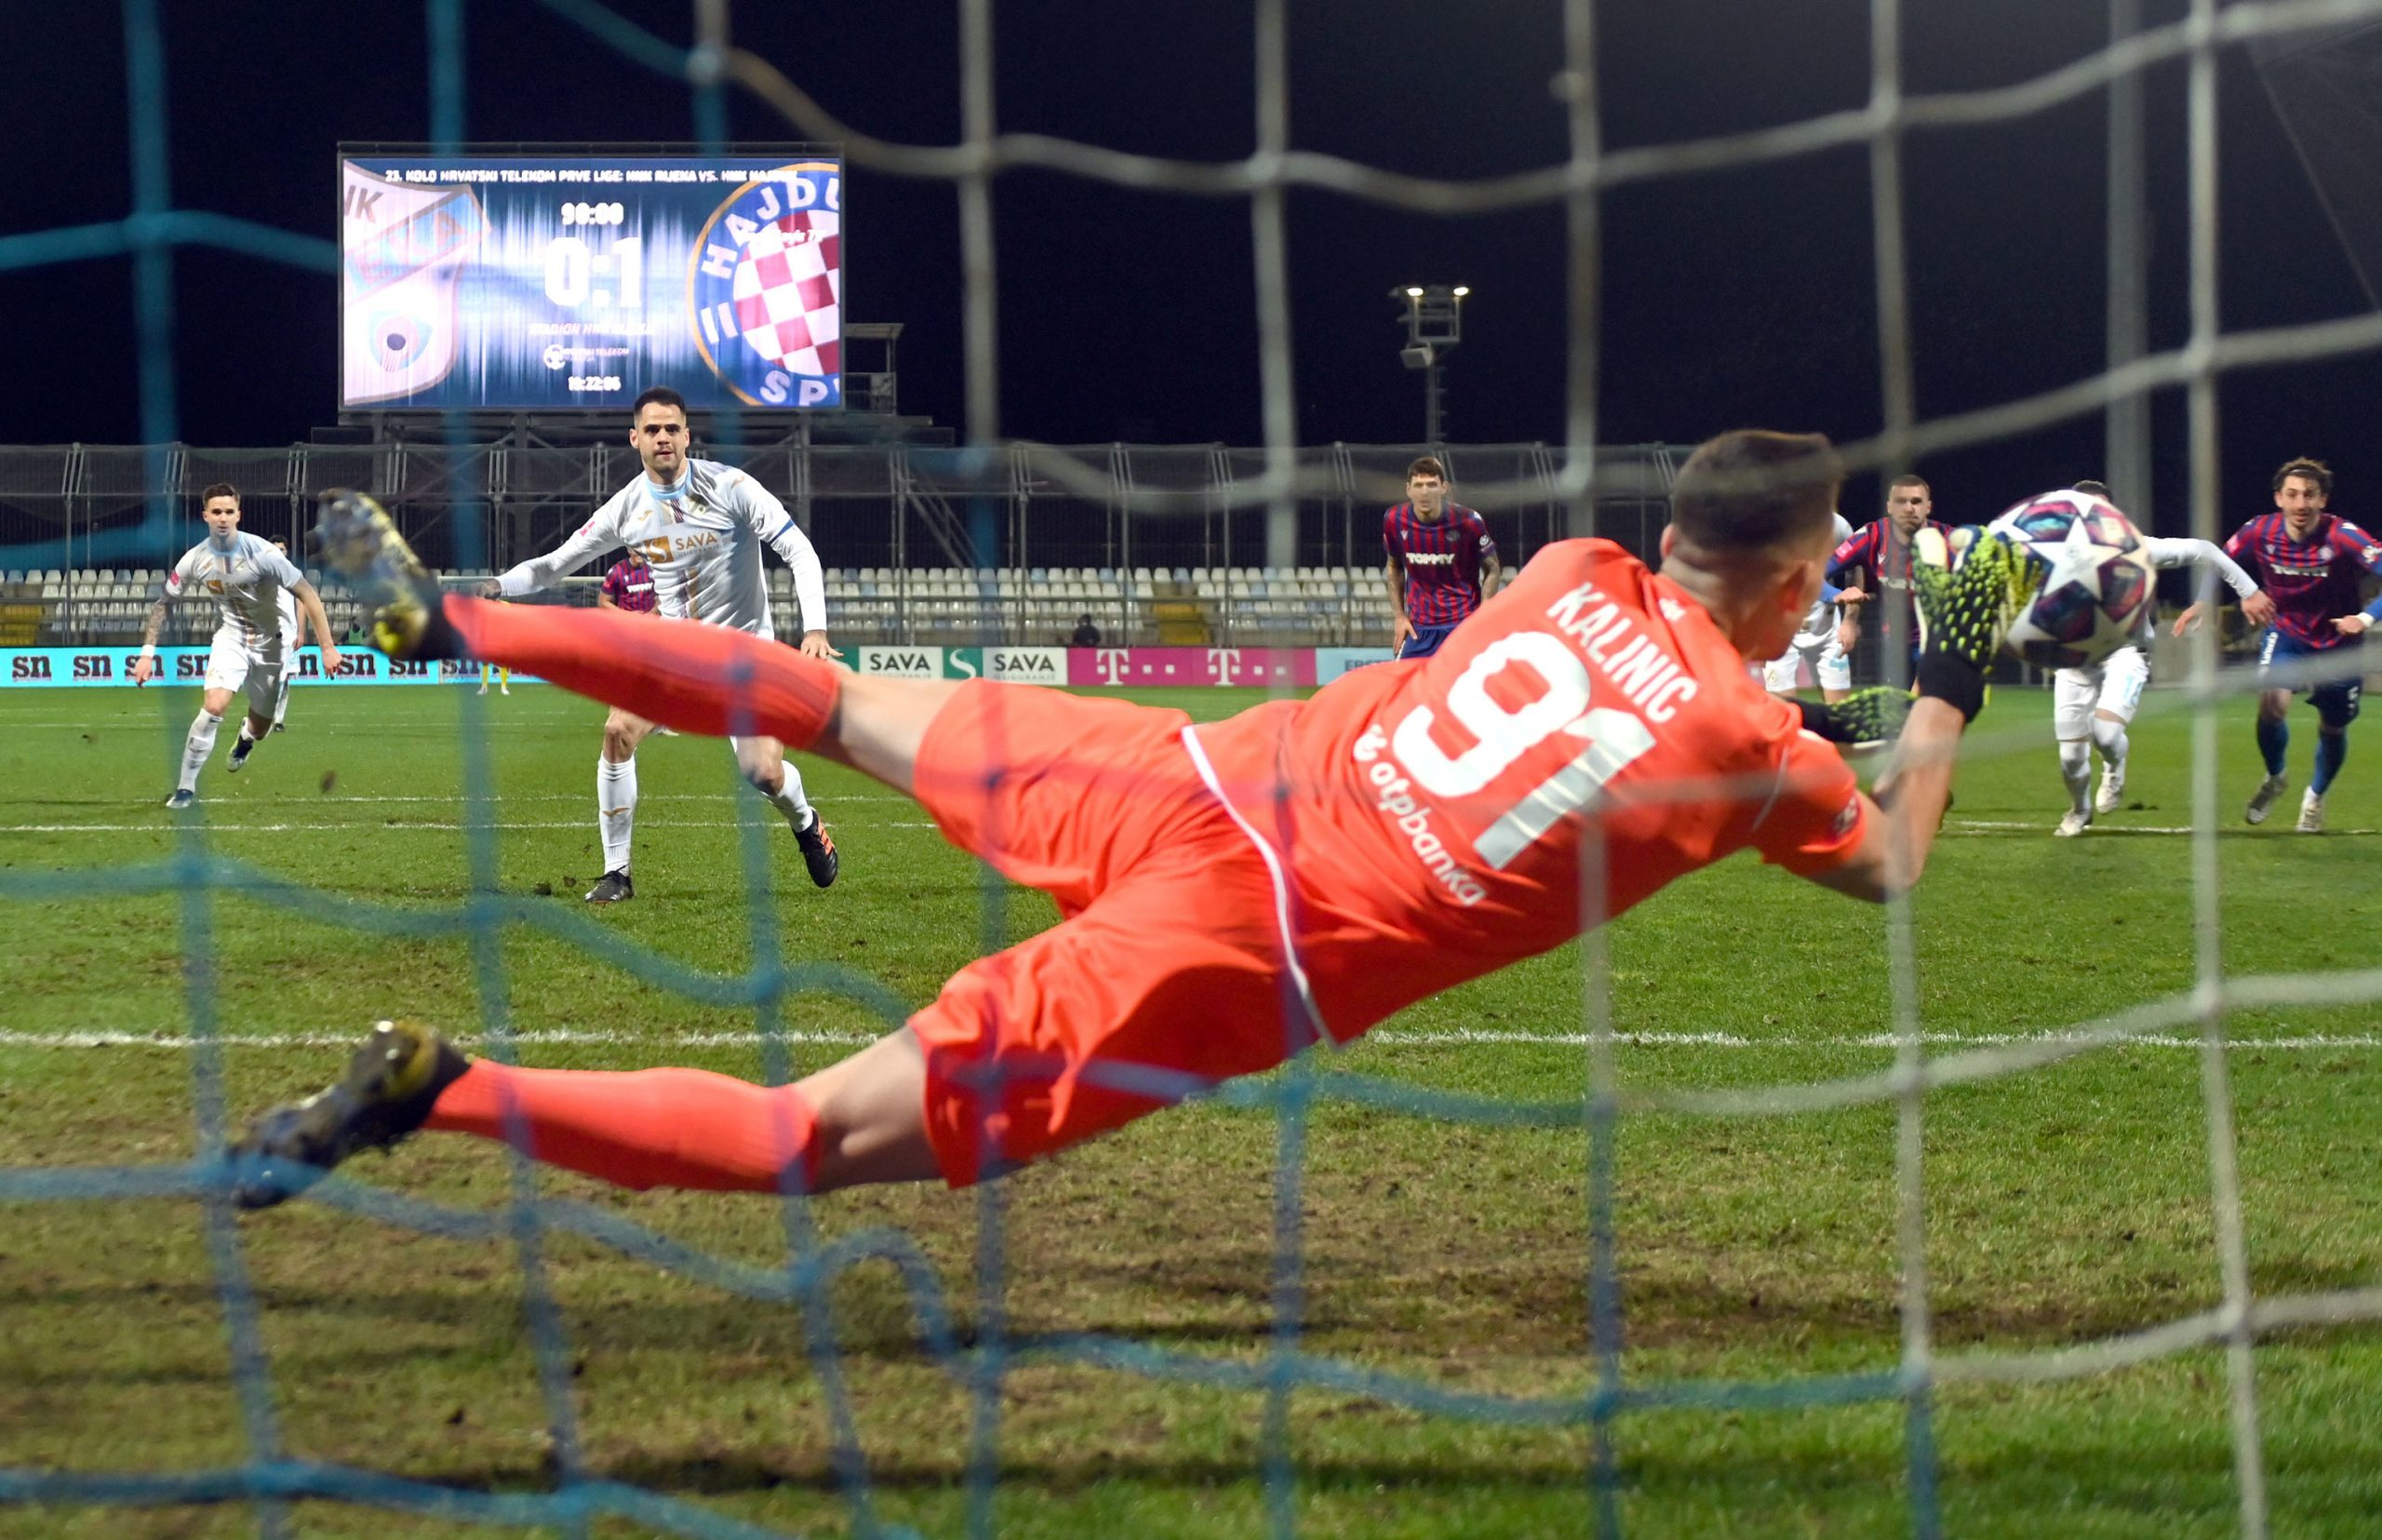 Lovre Kalinić nadmudrio je Franka Andrijaševića u finišu utakmice/Foto Arhiva NL